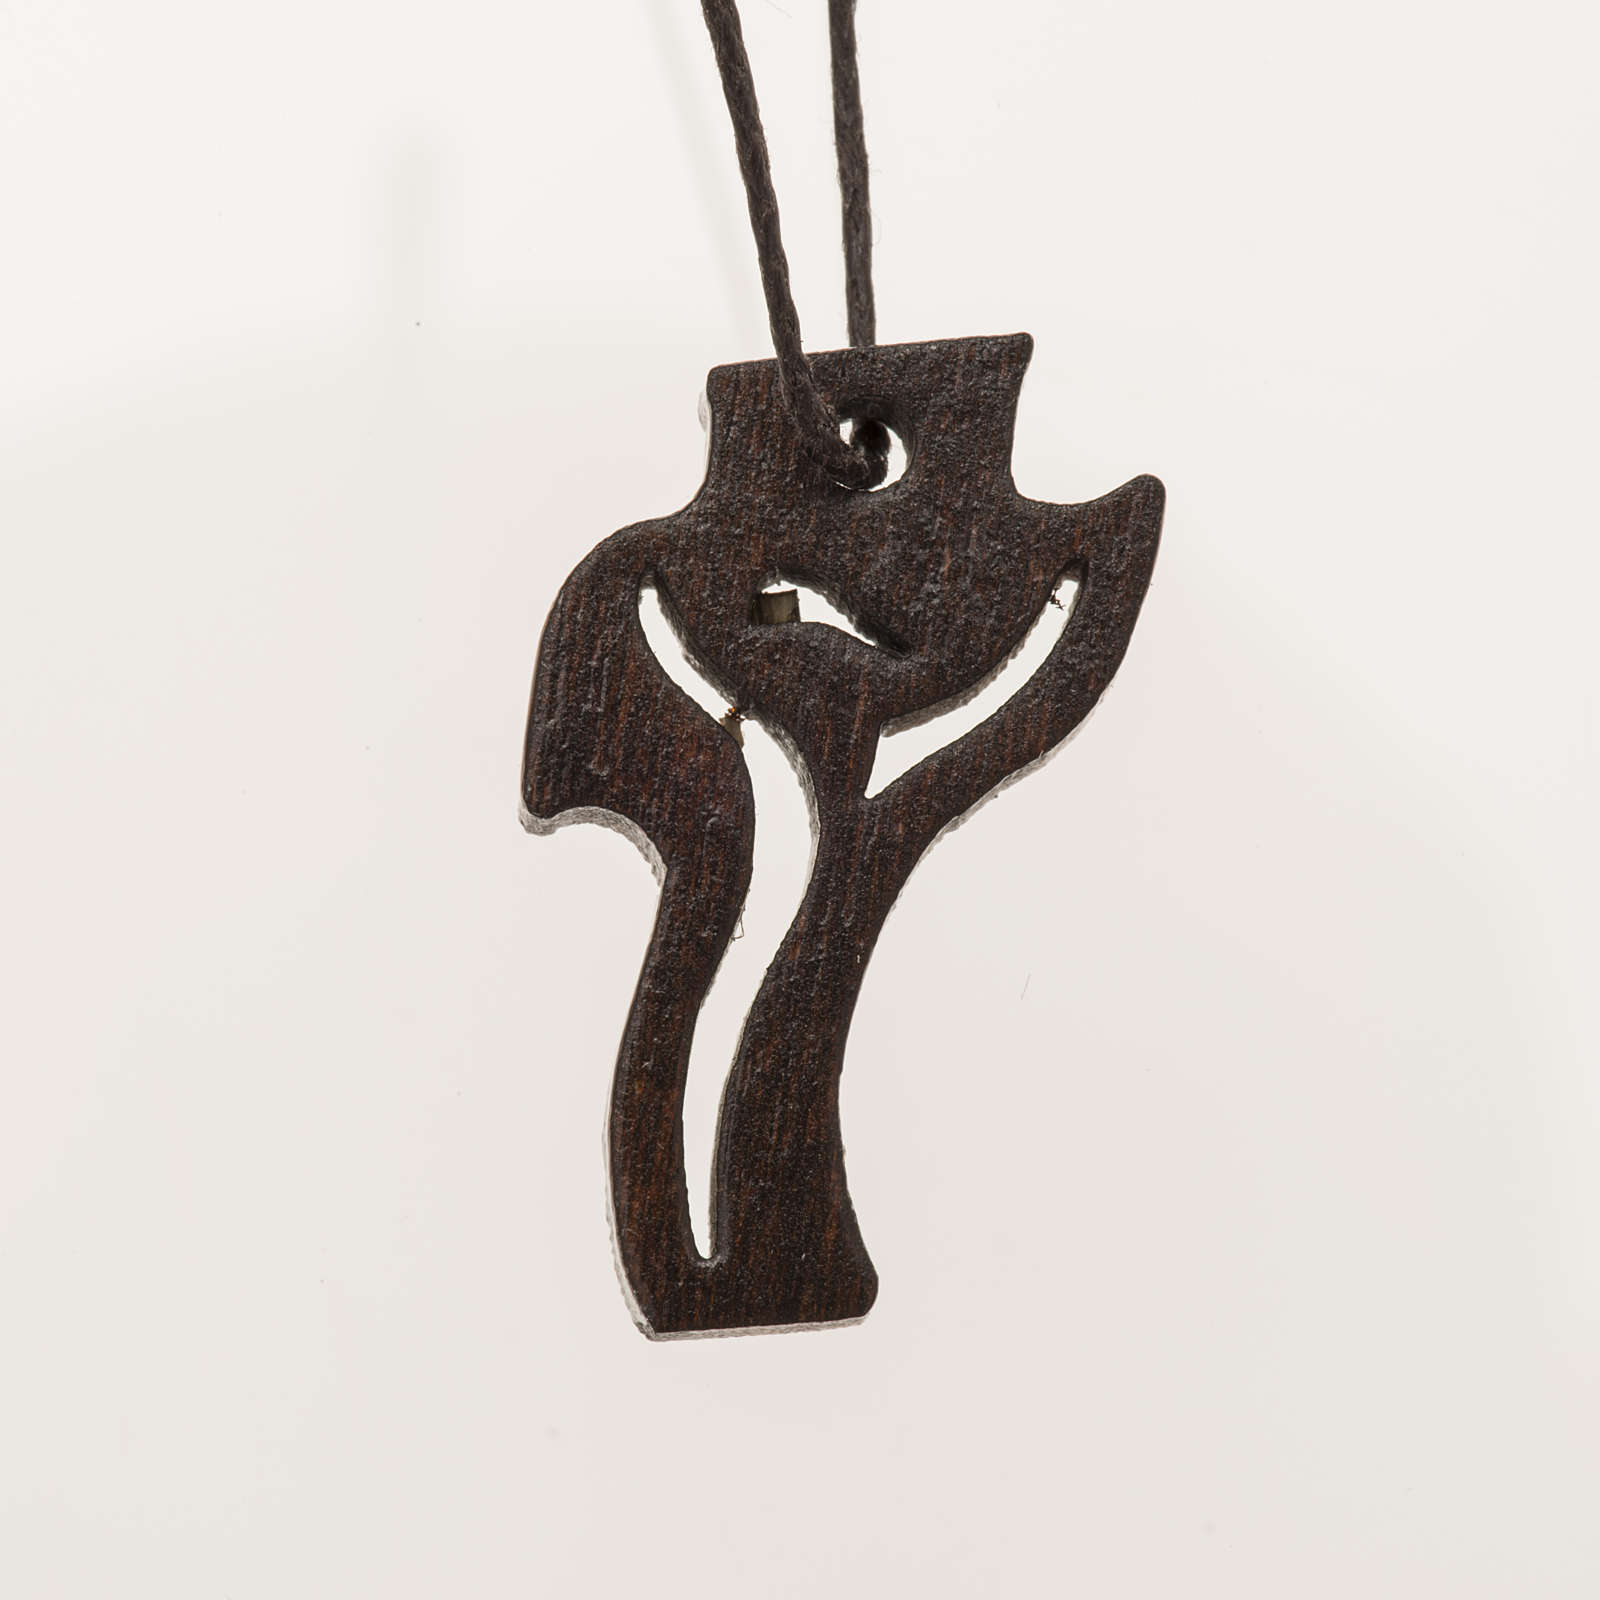 Cruz primera comunión Resucitado madera oscura 3,6 x 2 cm 4